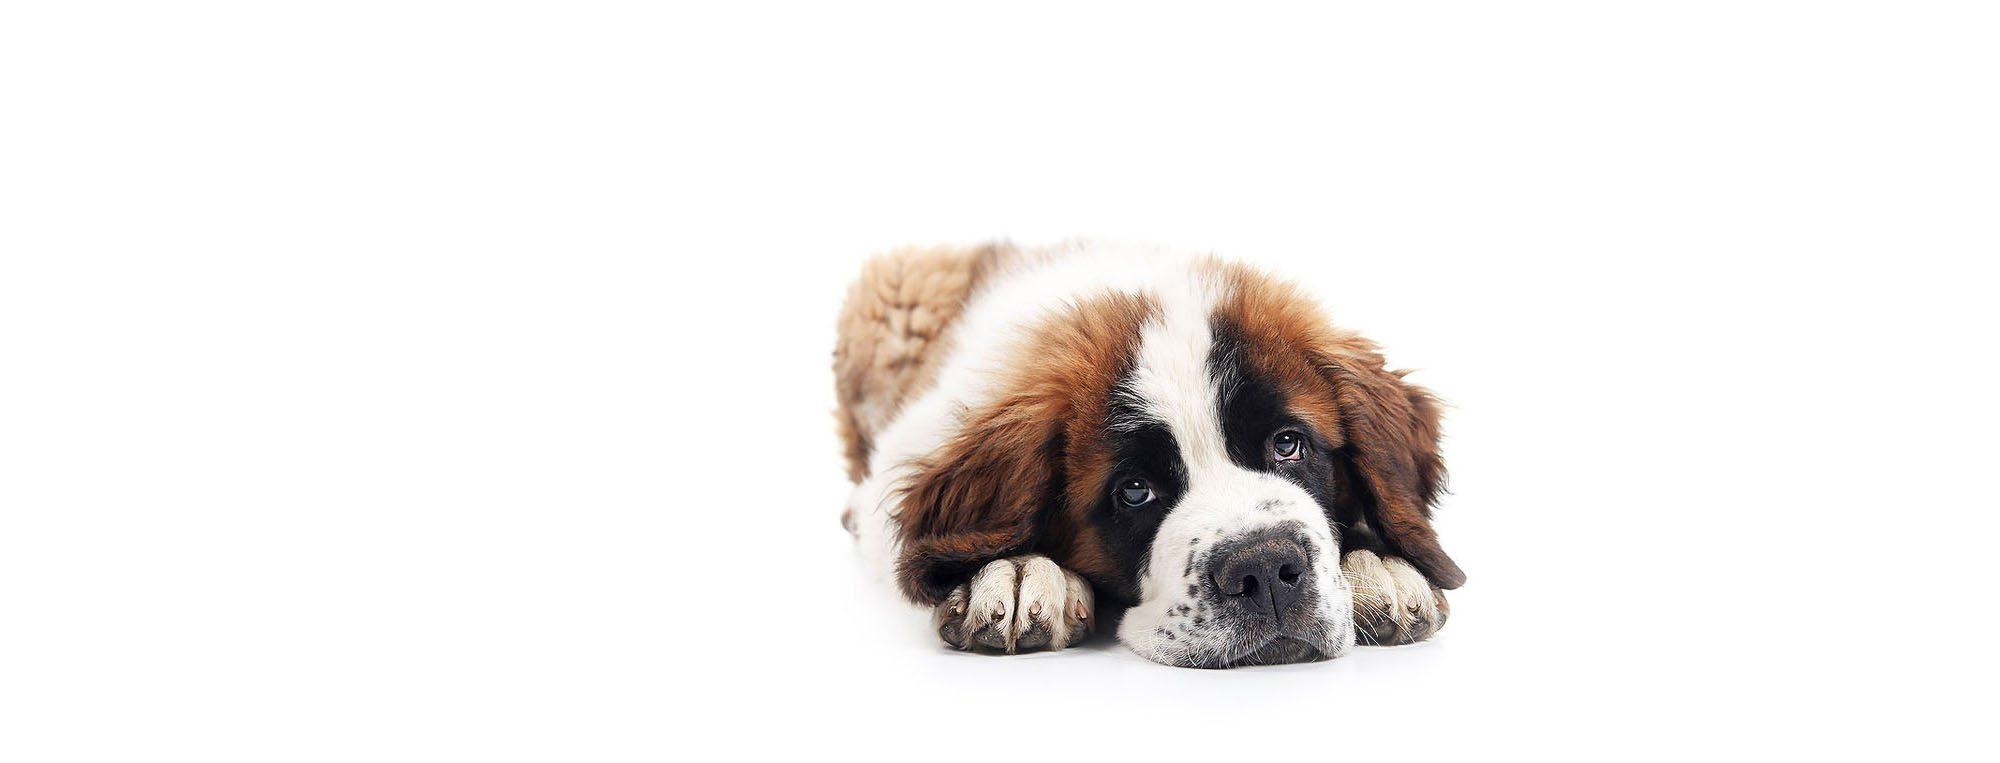 Dog Resting